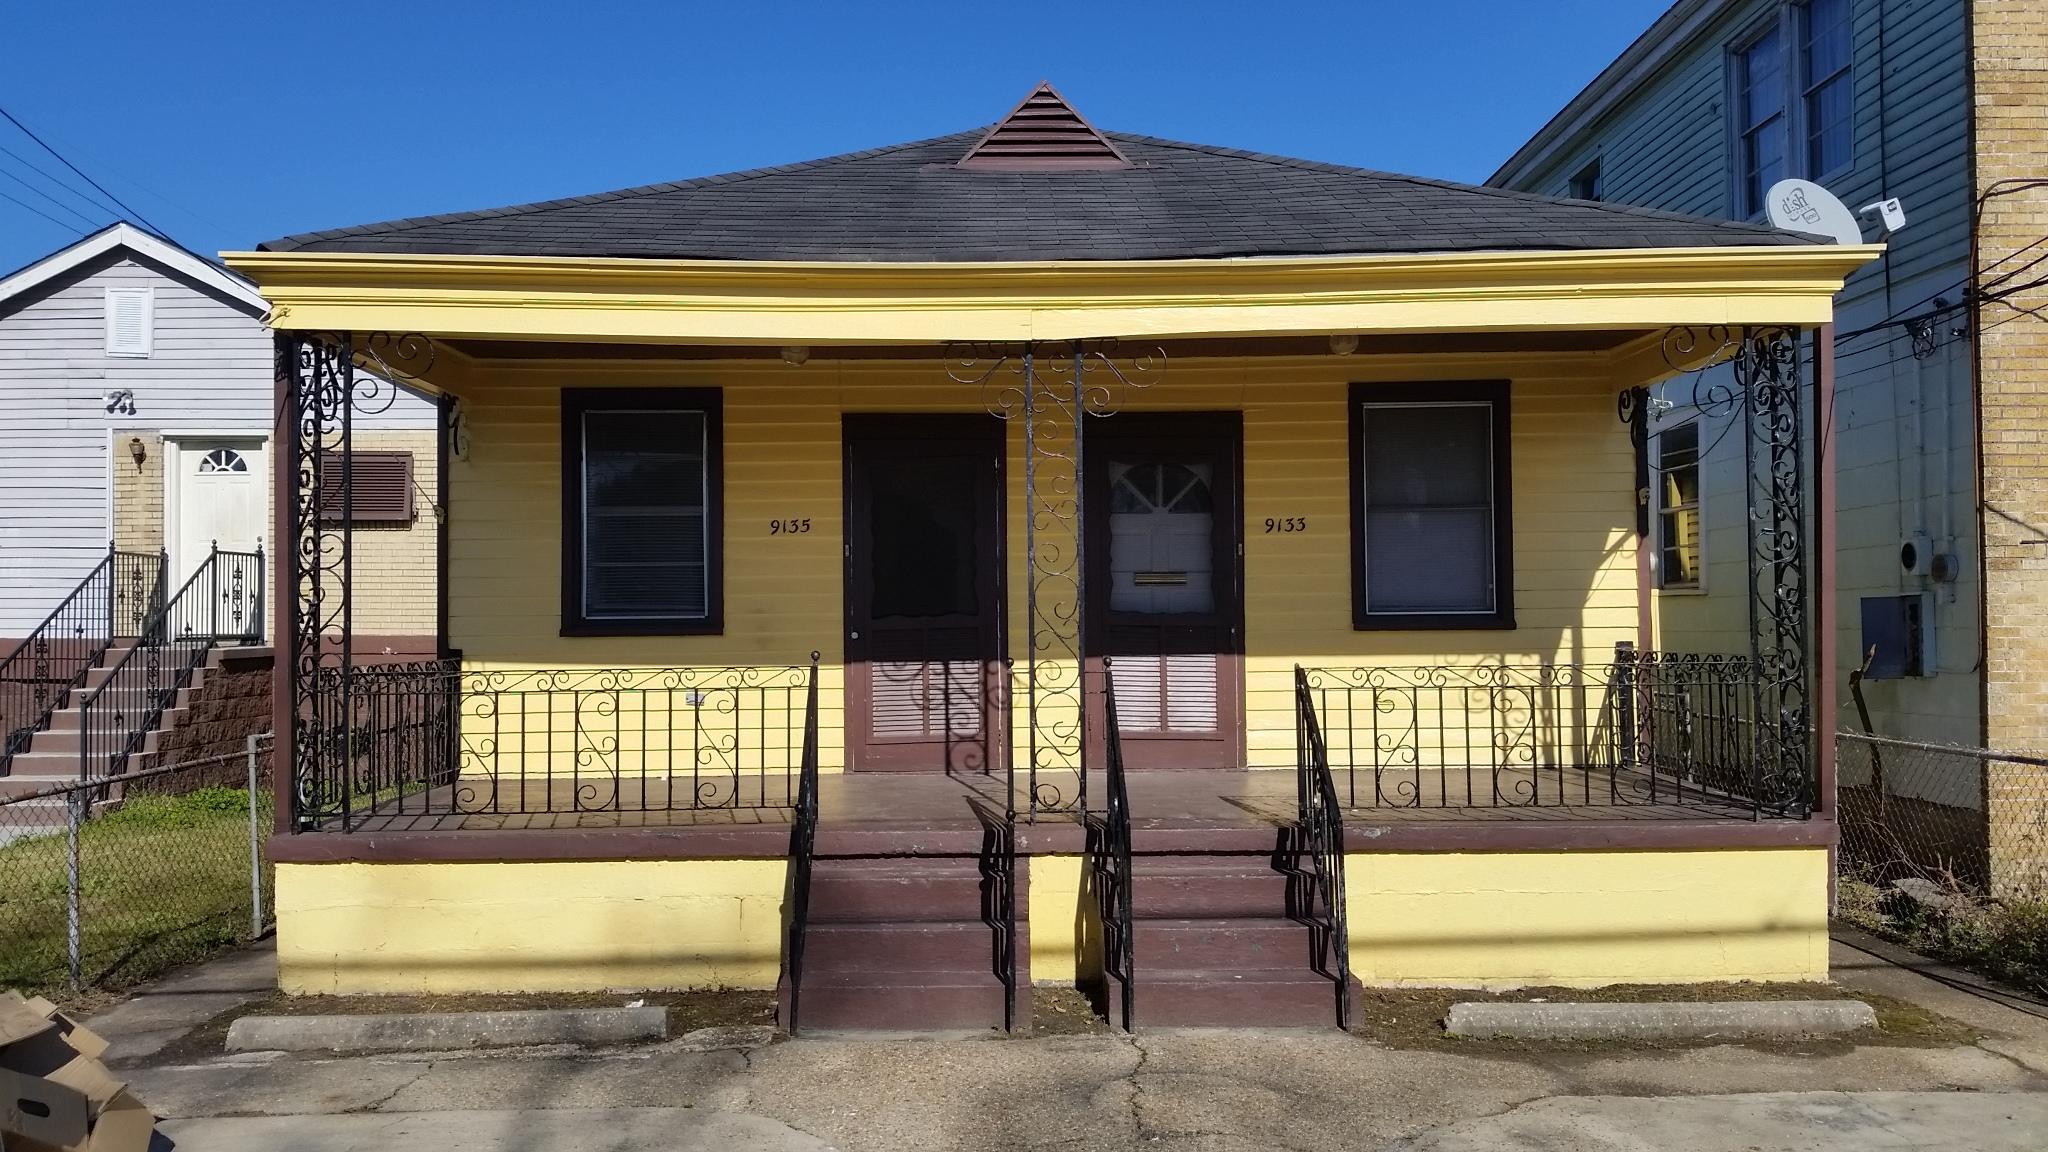 9133 Fig Street, New Orleans, Louisiana 70118